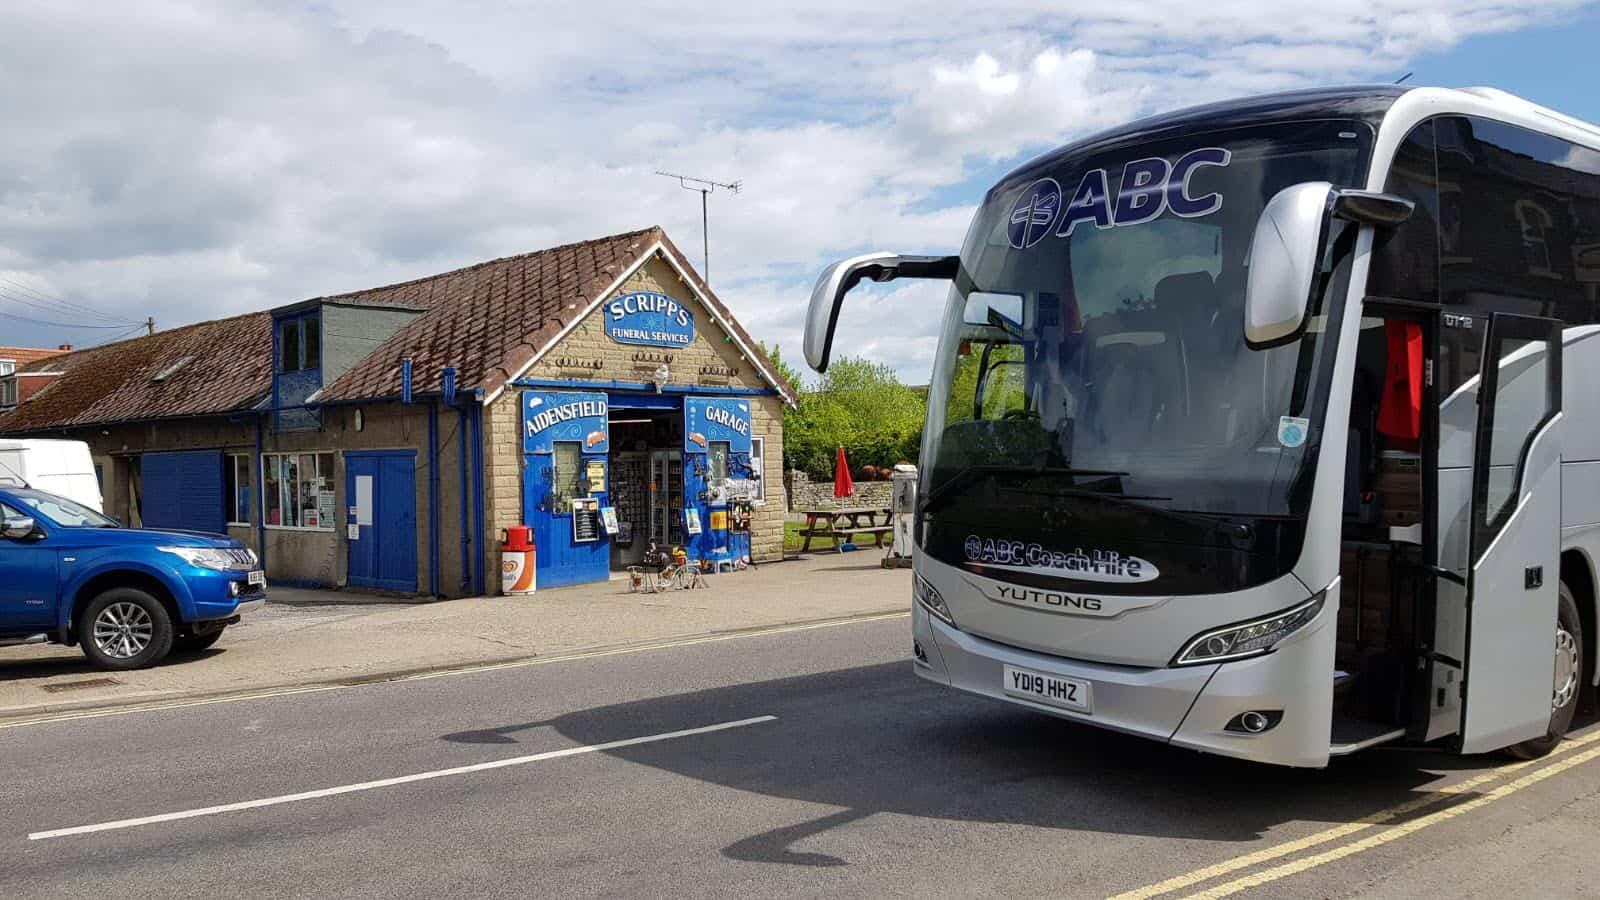 Yorkshire Dales - Heartbeat - Emmerdale - TV - Coach Tours